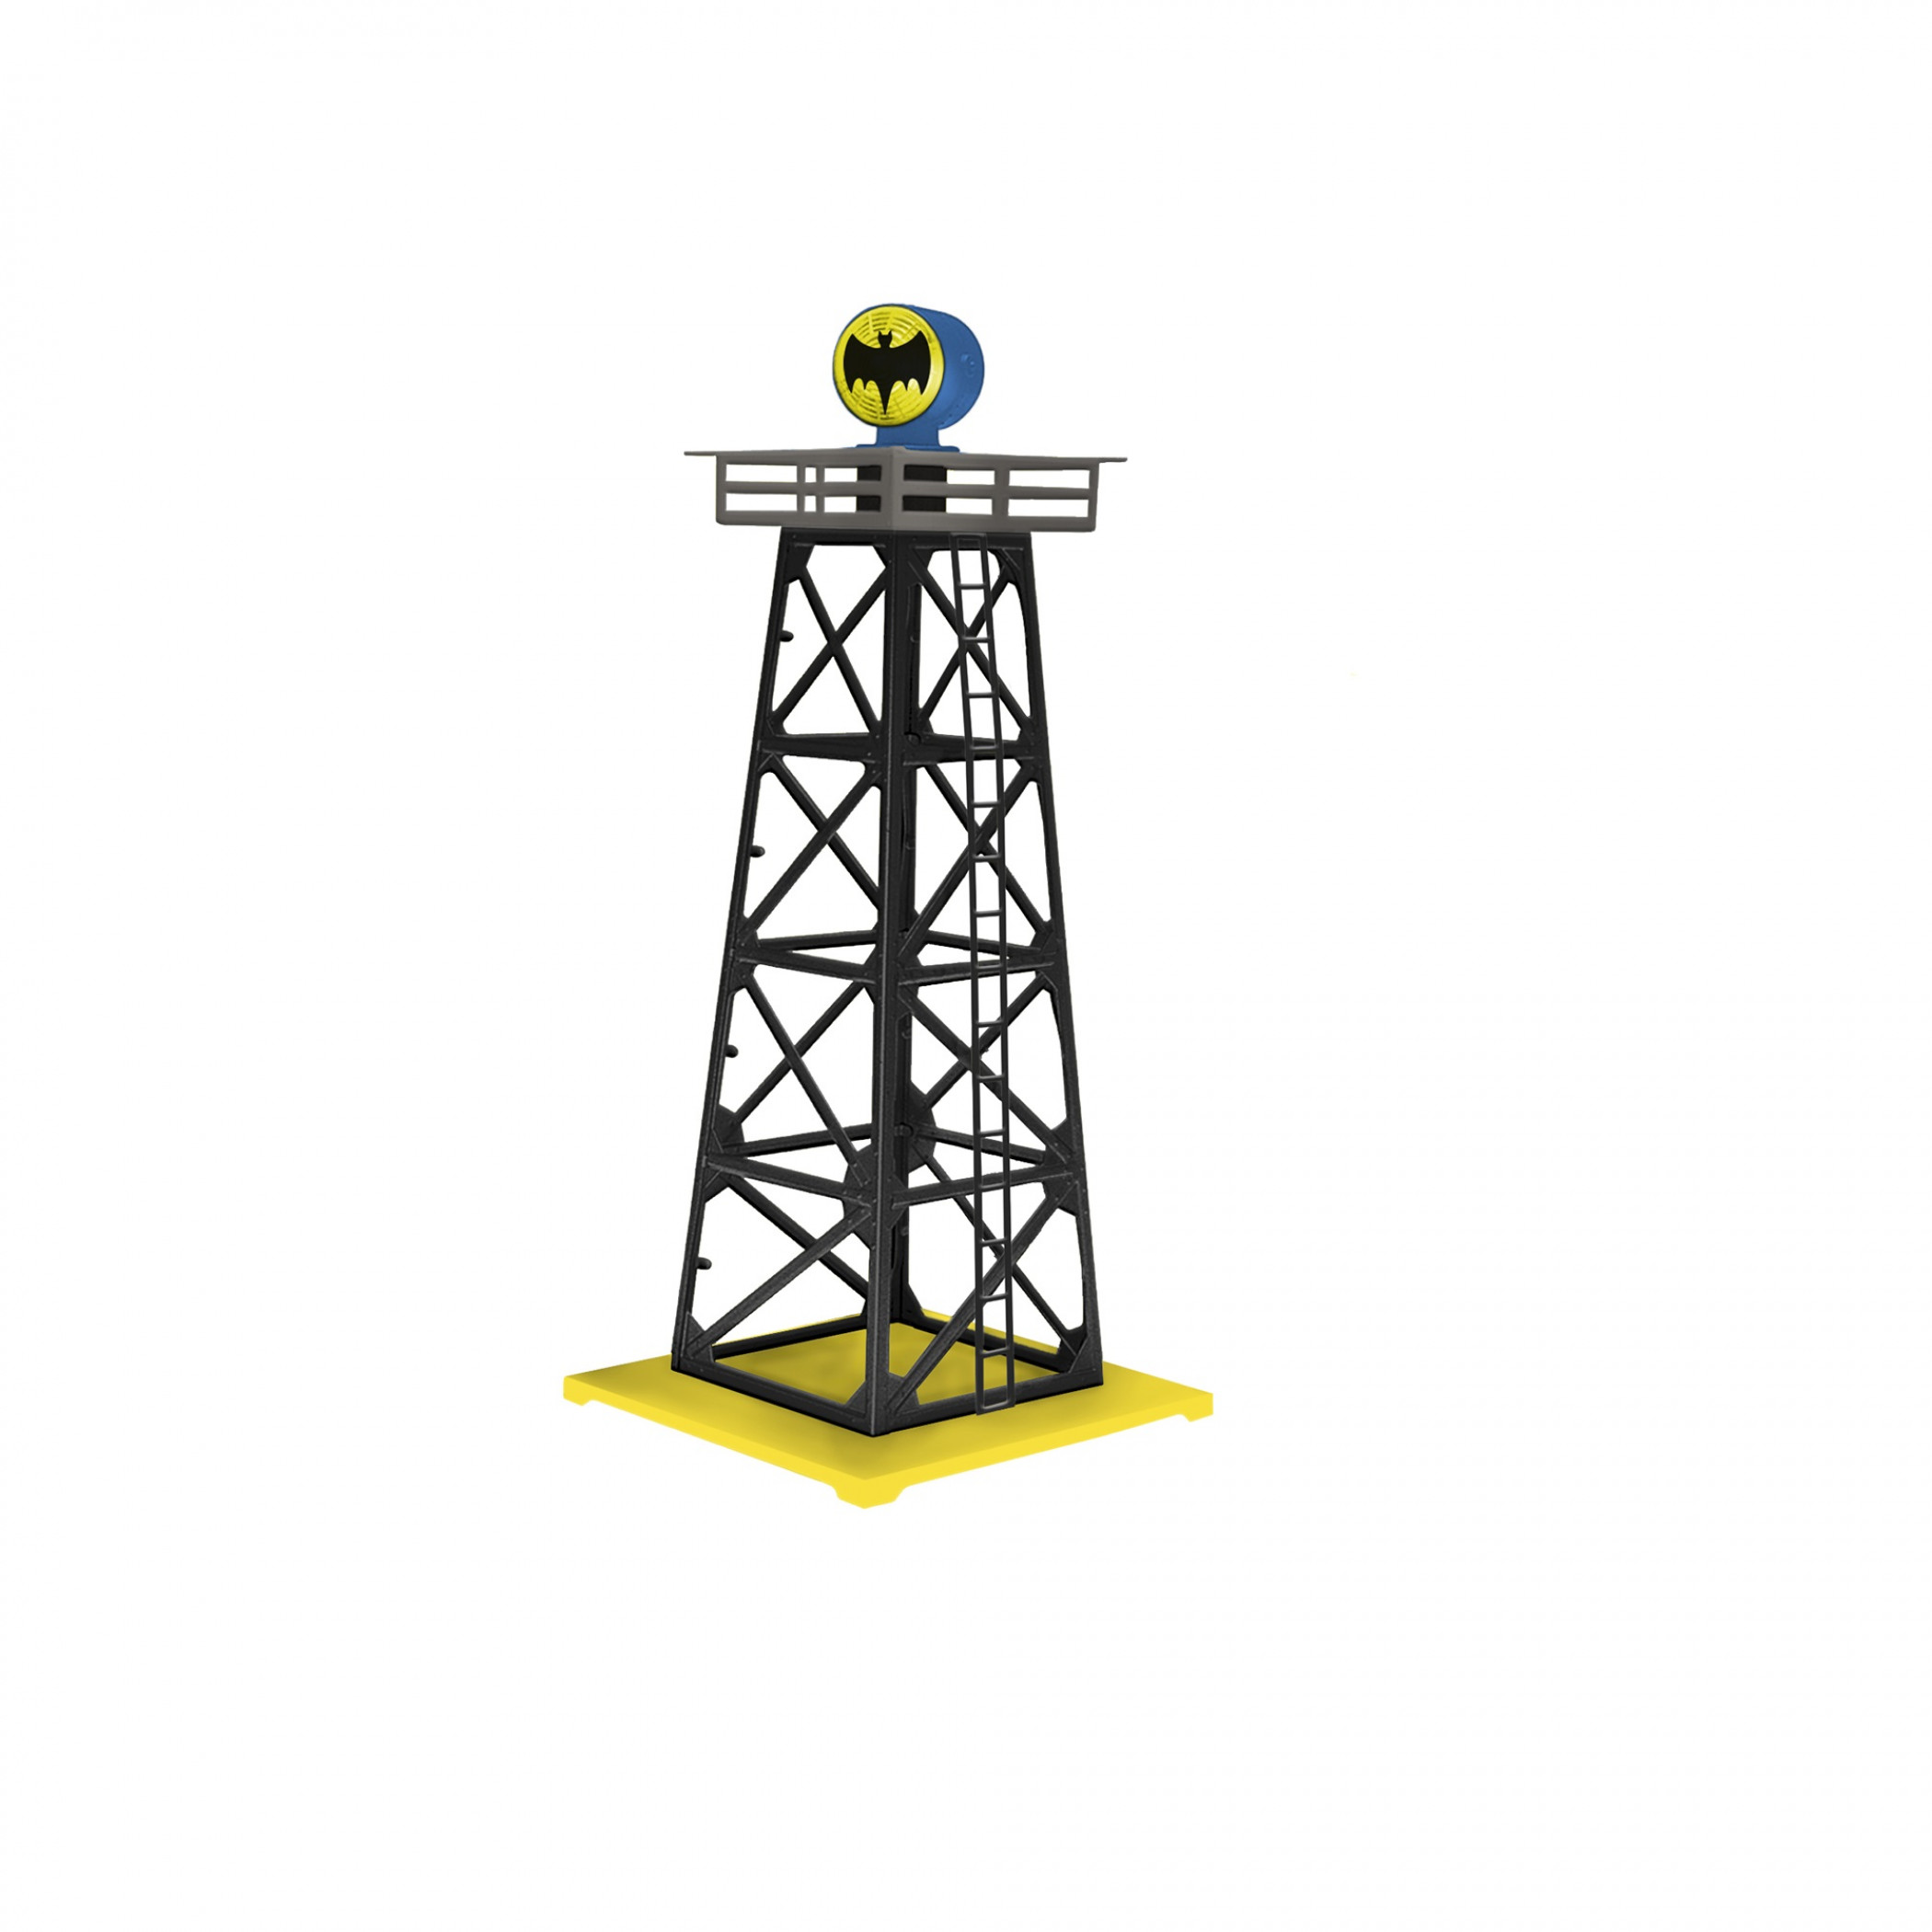 Batman Lionel Rotary Beacon for Train Sets